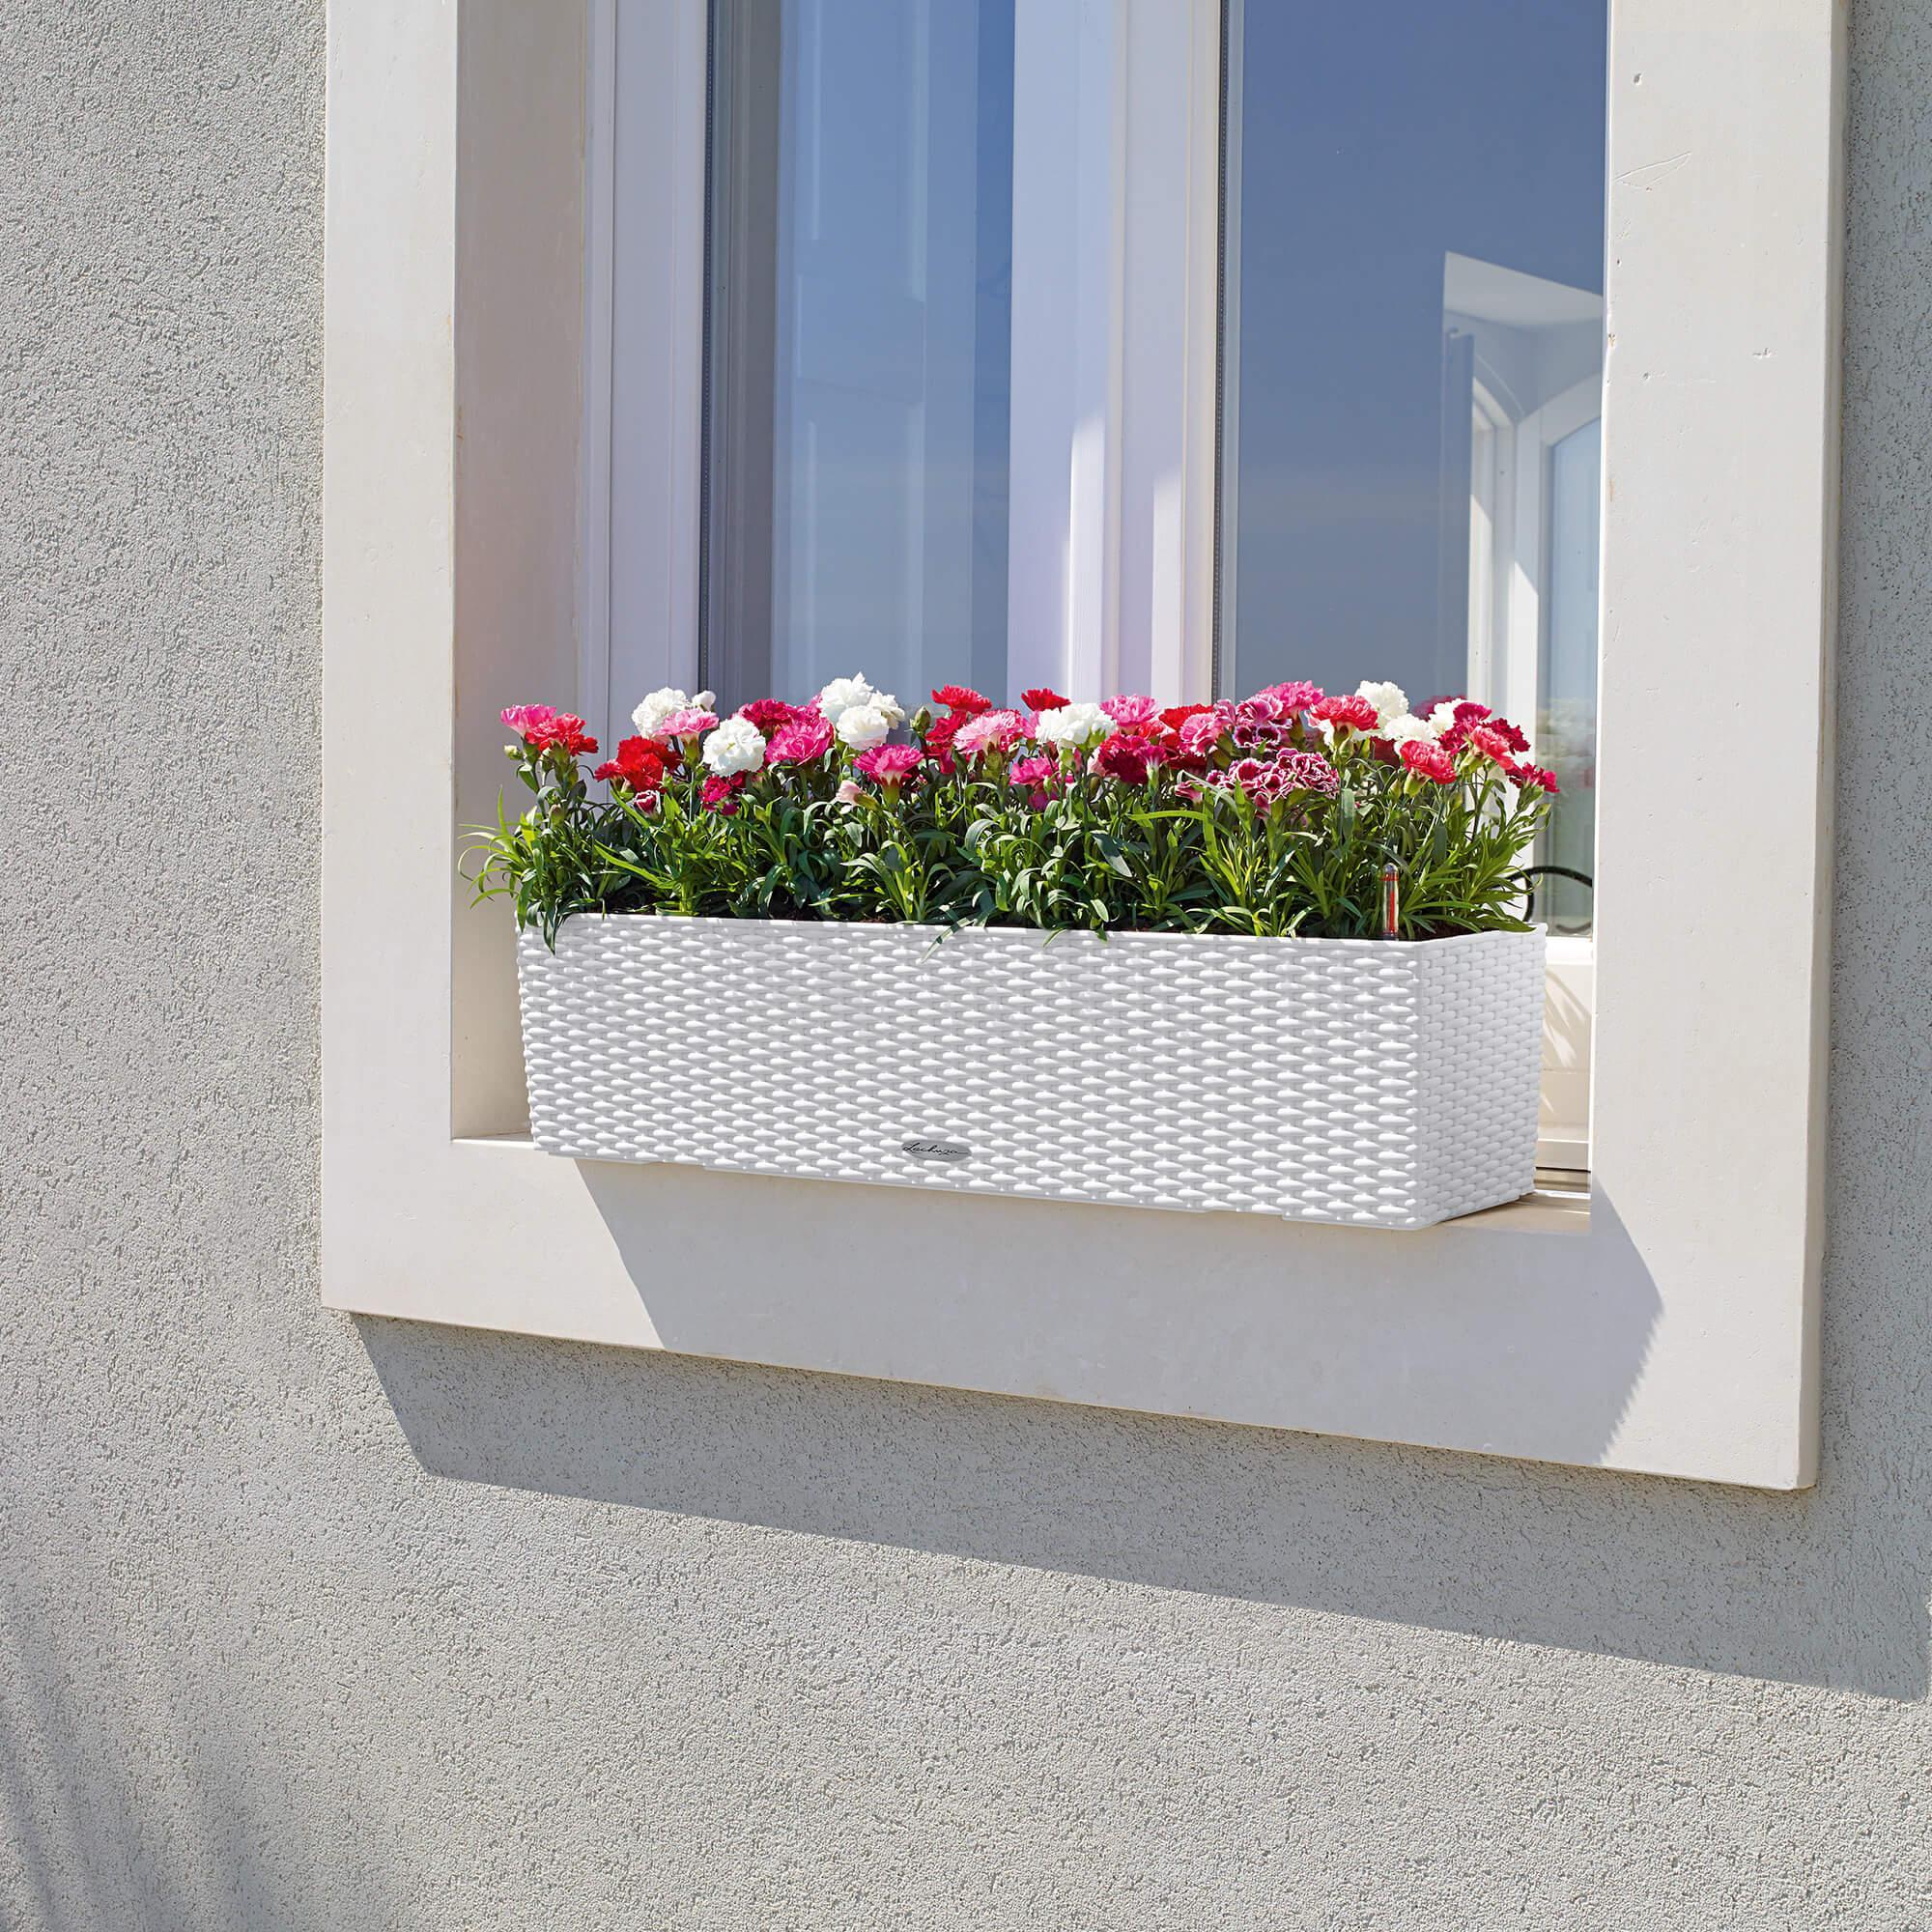 le_balconera-cottage80_product_addi_01